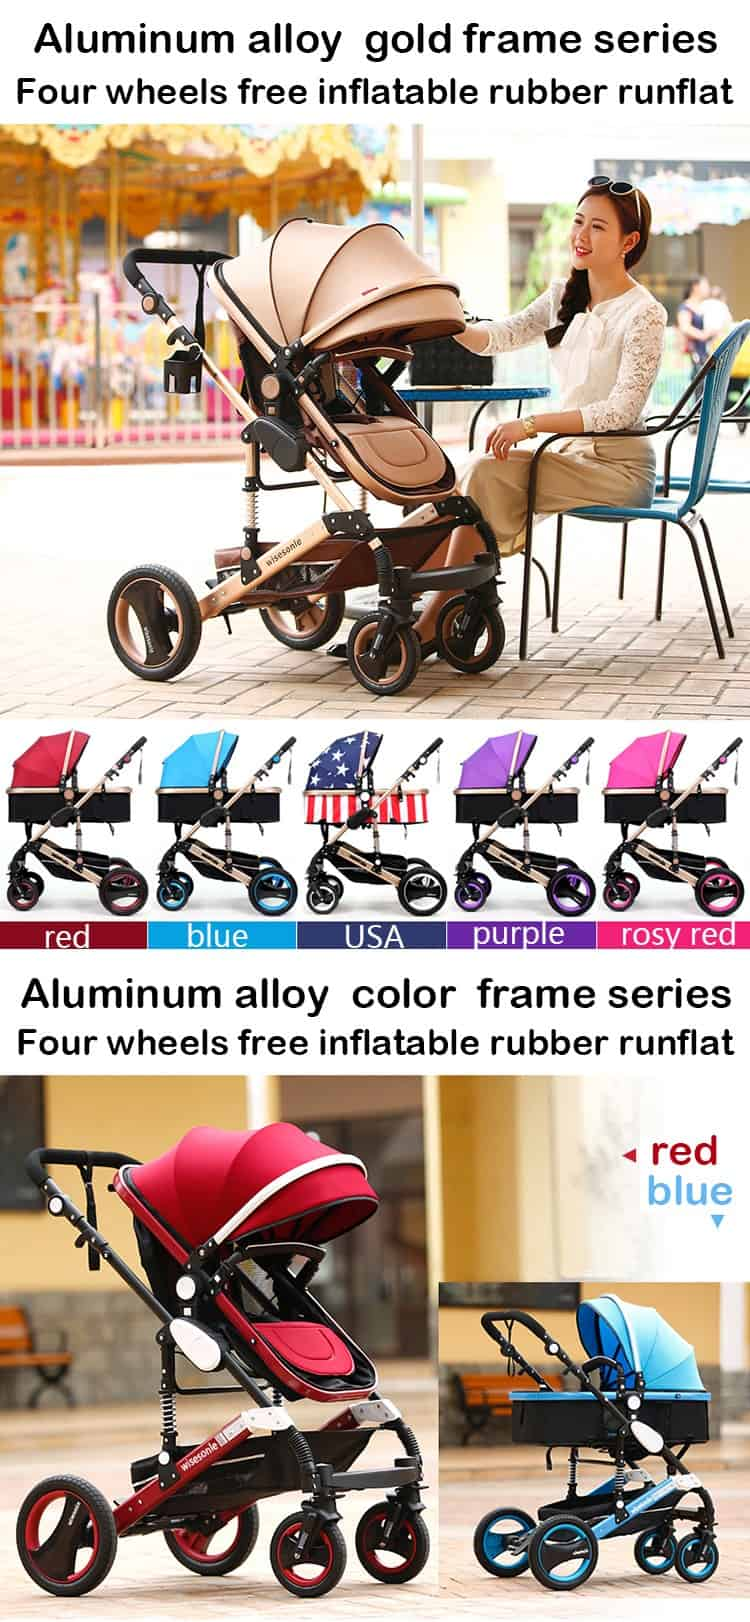 Wisesonle baby stroller 2 in 1 stroller